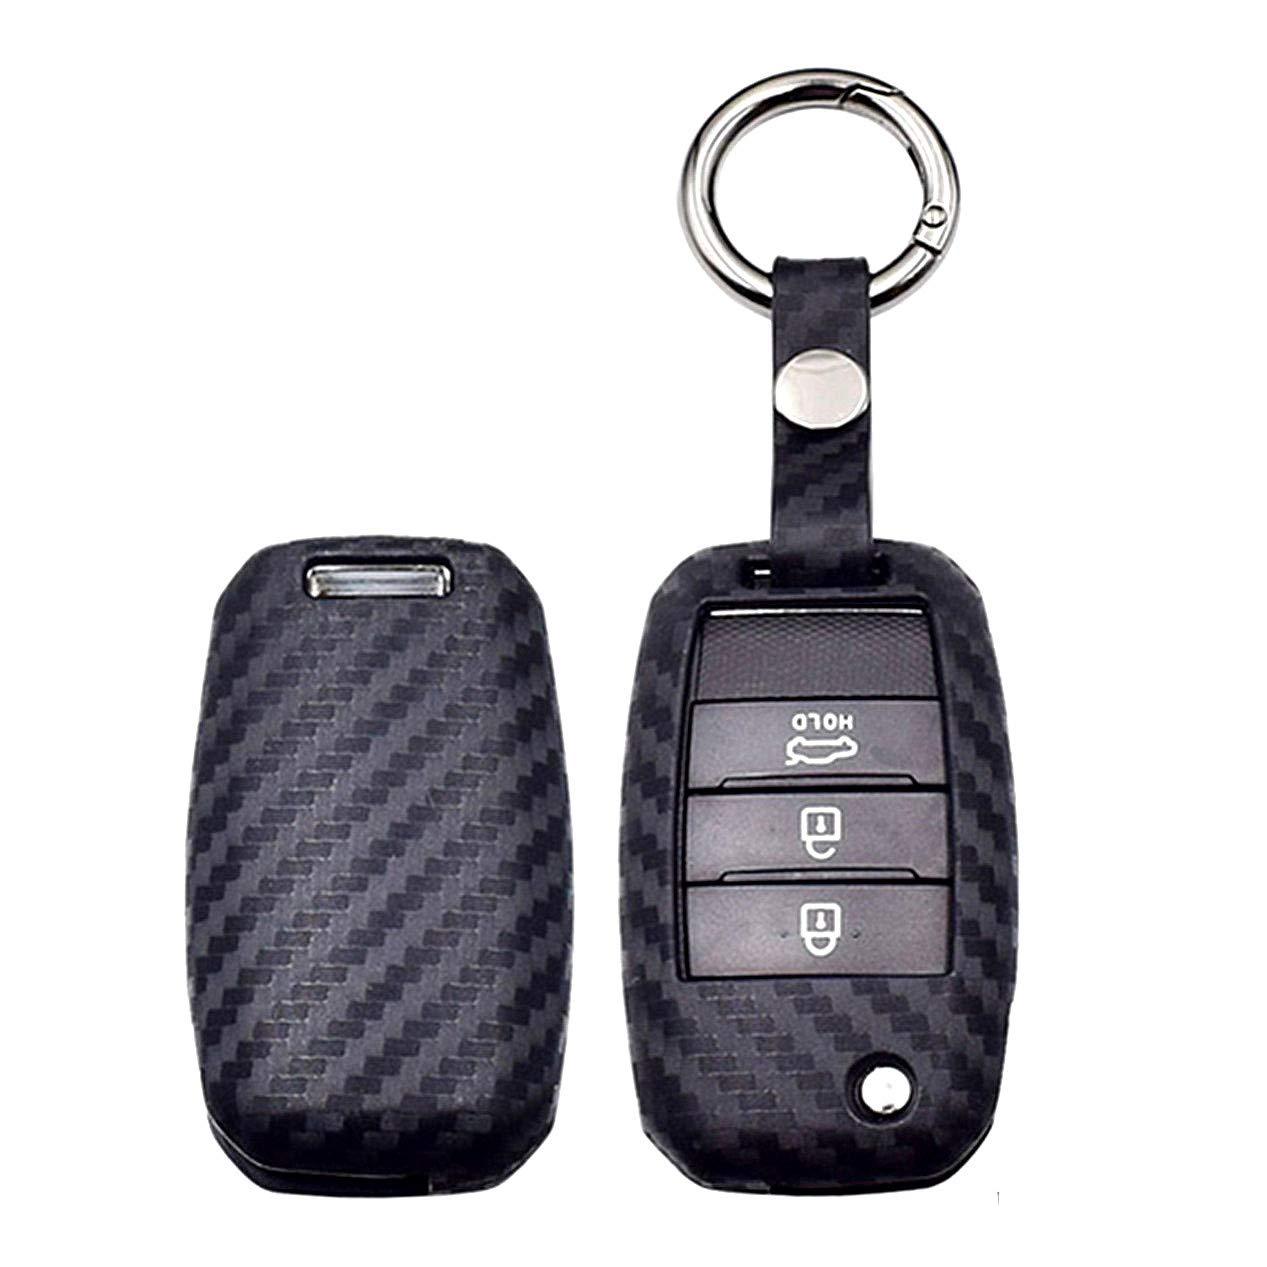 WFMJ 1x Red Silicone Key Cover 1x Red Keyring 3 Buttons Flip Key Chain Fob Cover for Hyundai Tucson Santa Fe i20 Creta Elantra